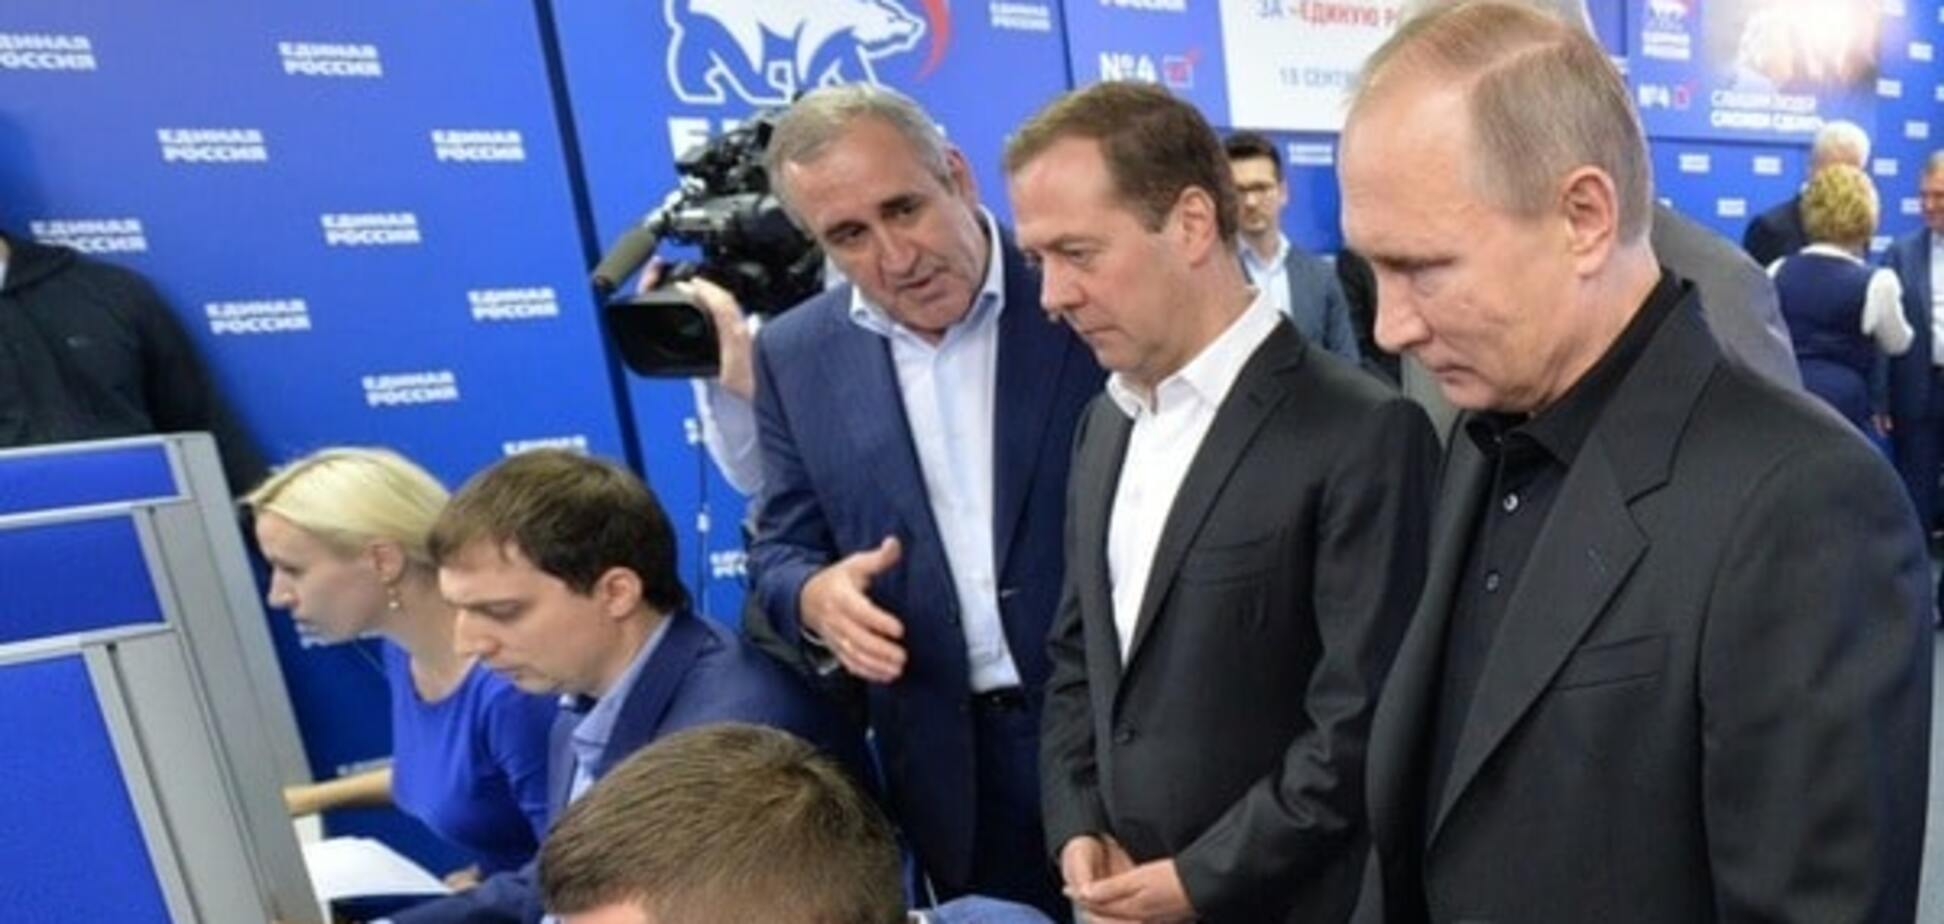 Россияне променяли свободу на колбасу